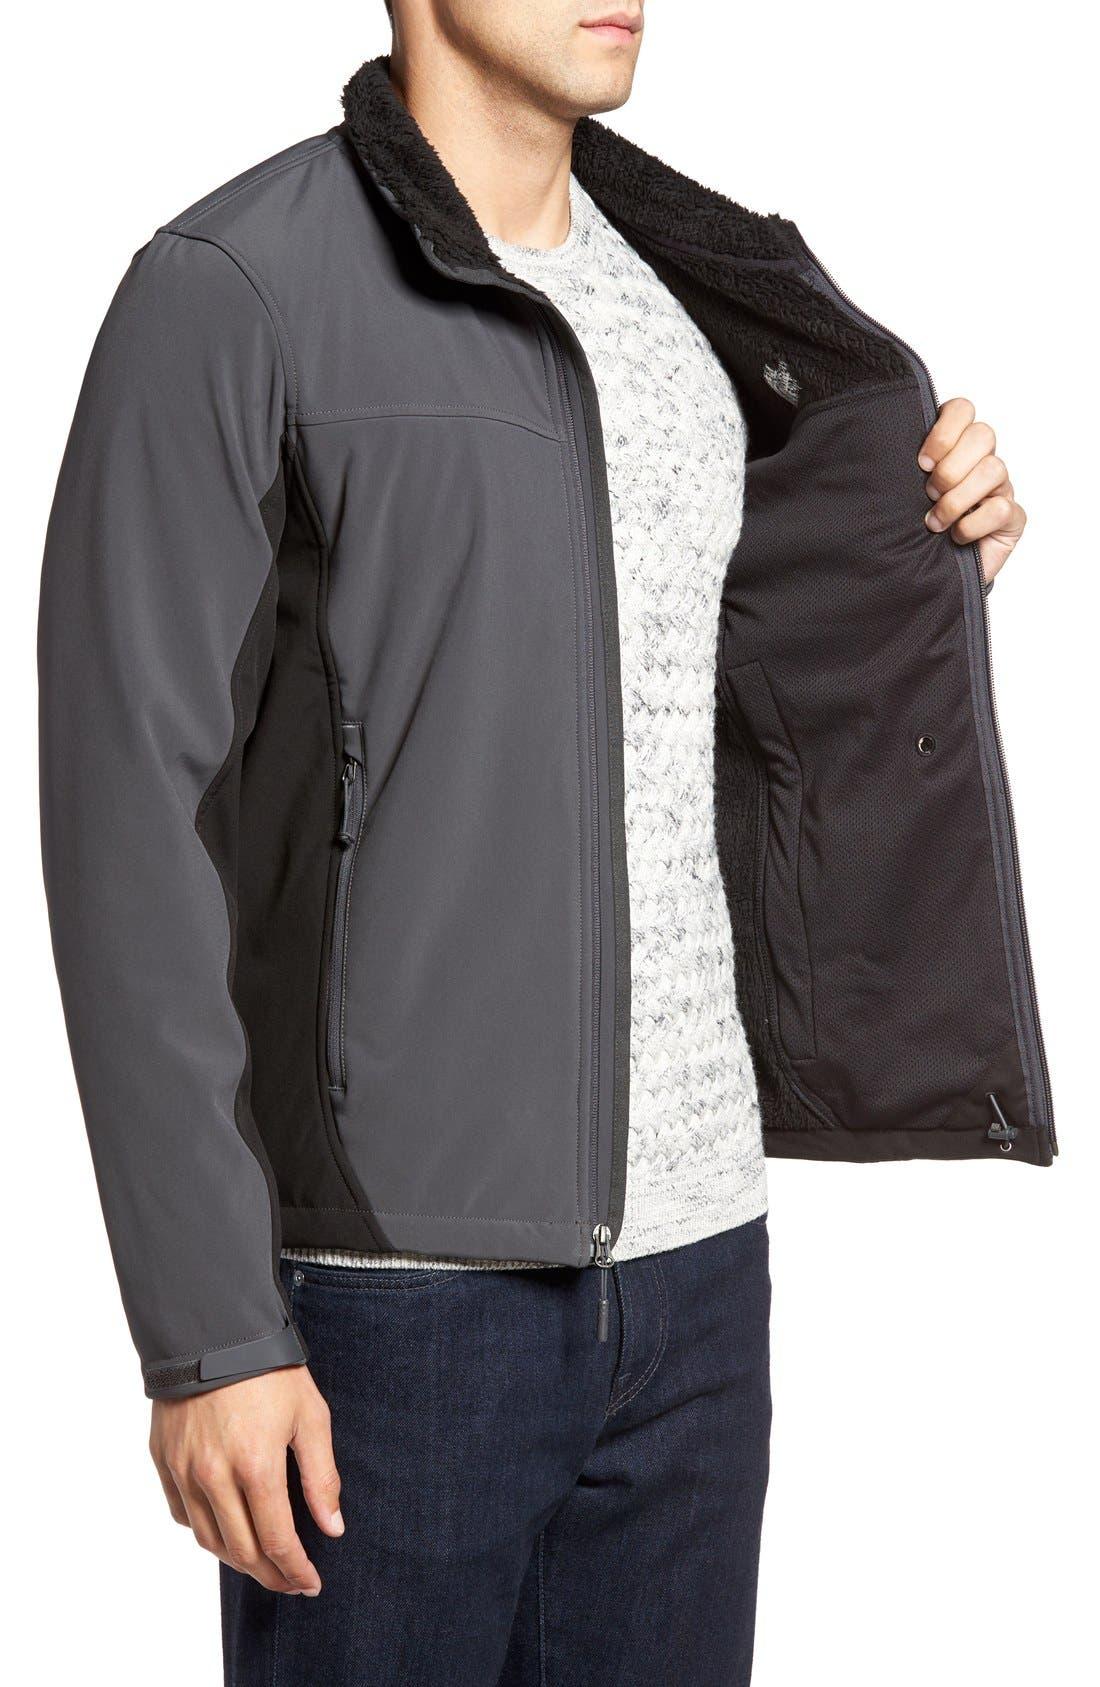 'Apex Chromium' Waterproof Thermal Jacket,                             Alternate thumbnail 3, color,                             Asphalt Grey/ Tnf Black